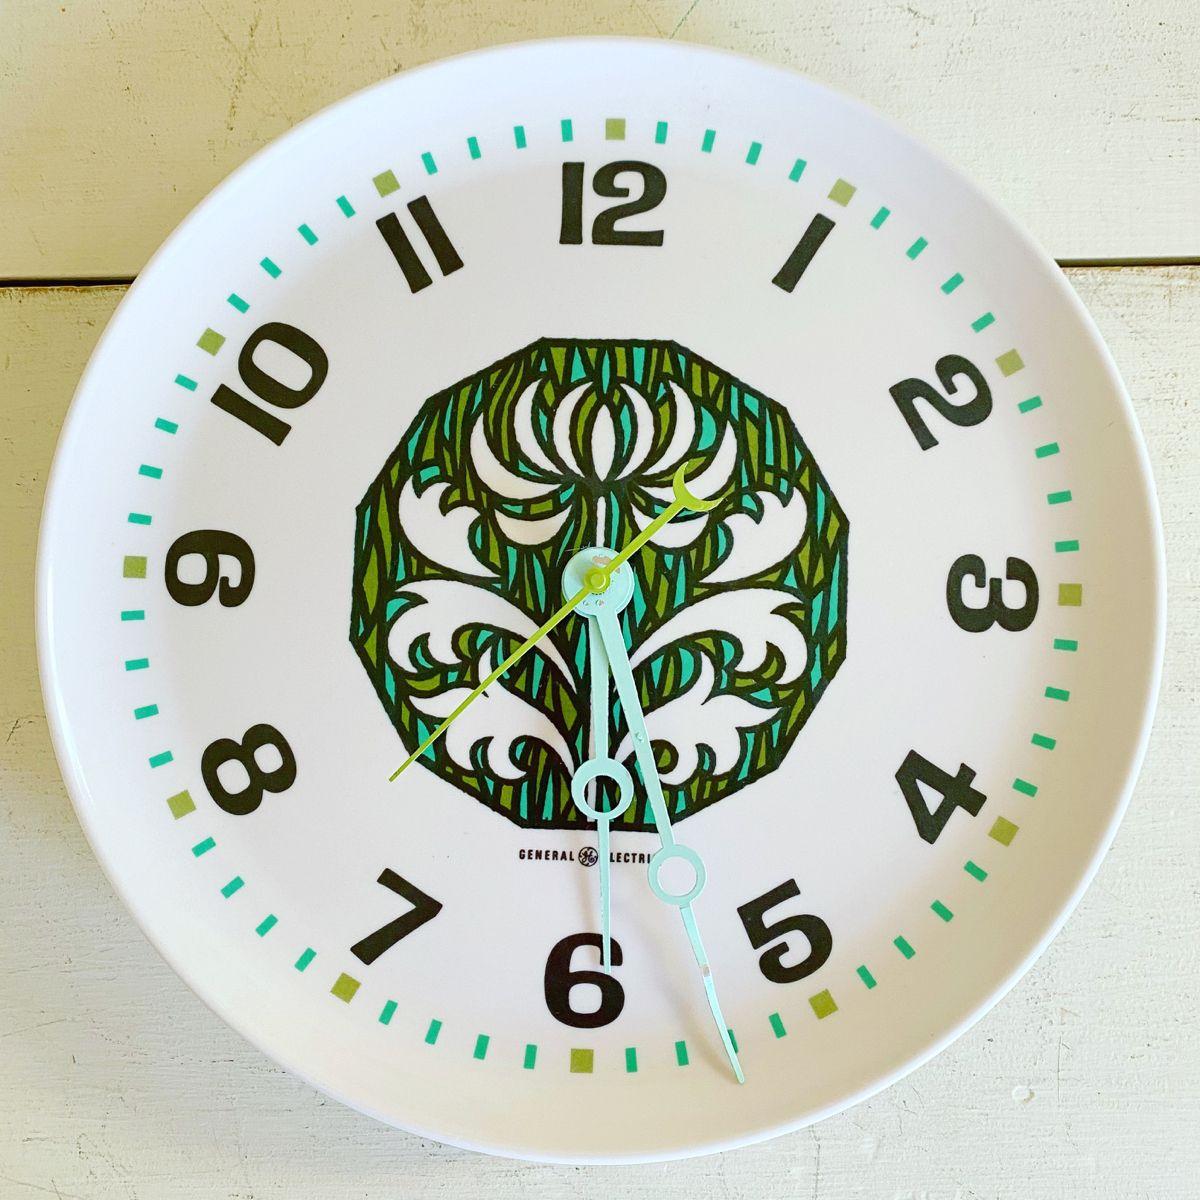 Vintage Wall Clock Ge Melamine Plate General Electric Etsy In 2020 Vintage Wall Clock Vintage Clock Melamine Plates